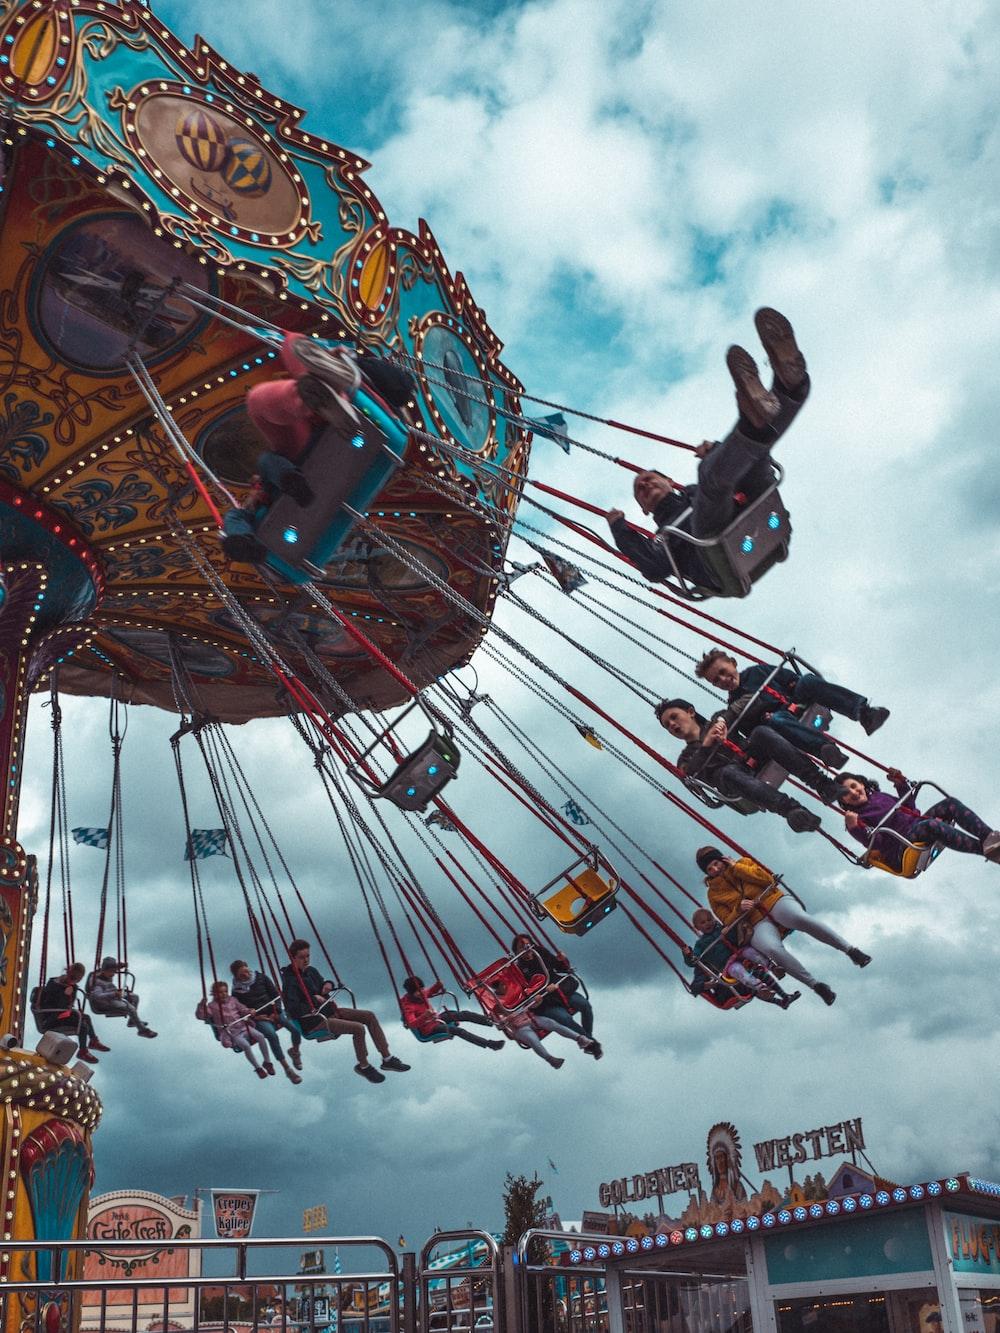 people riding swing amusement ride